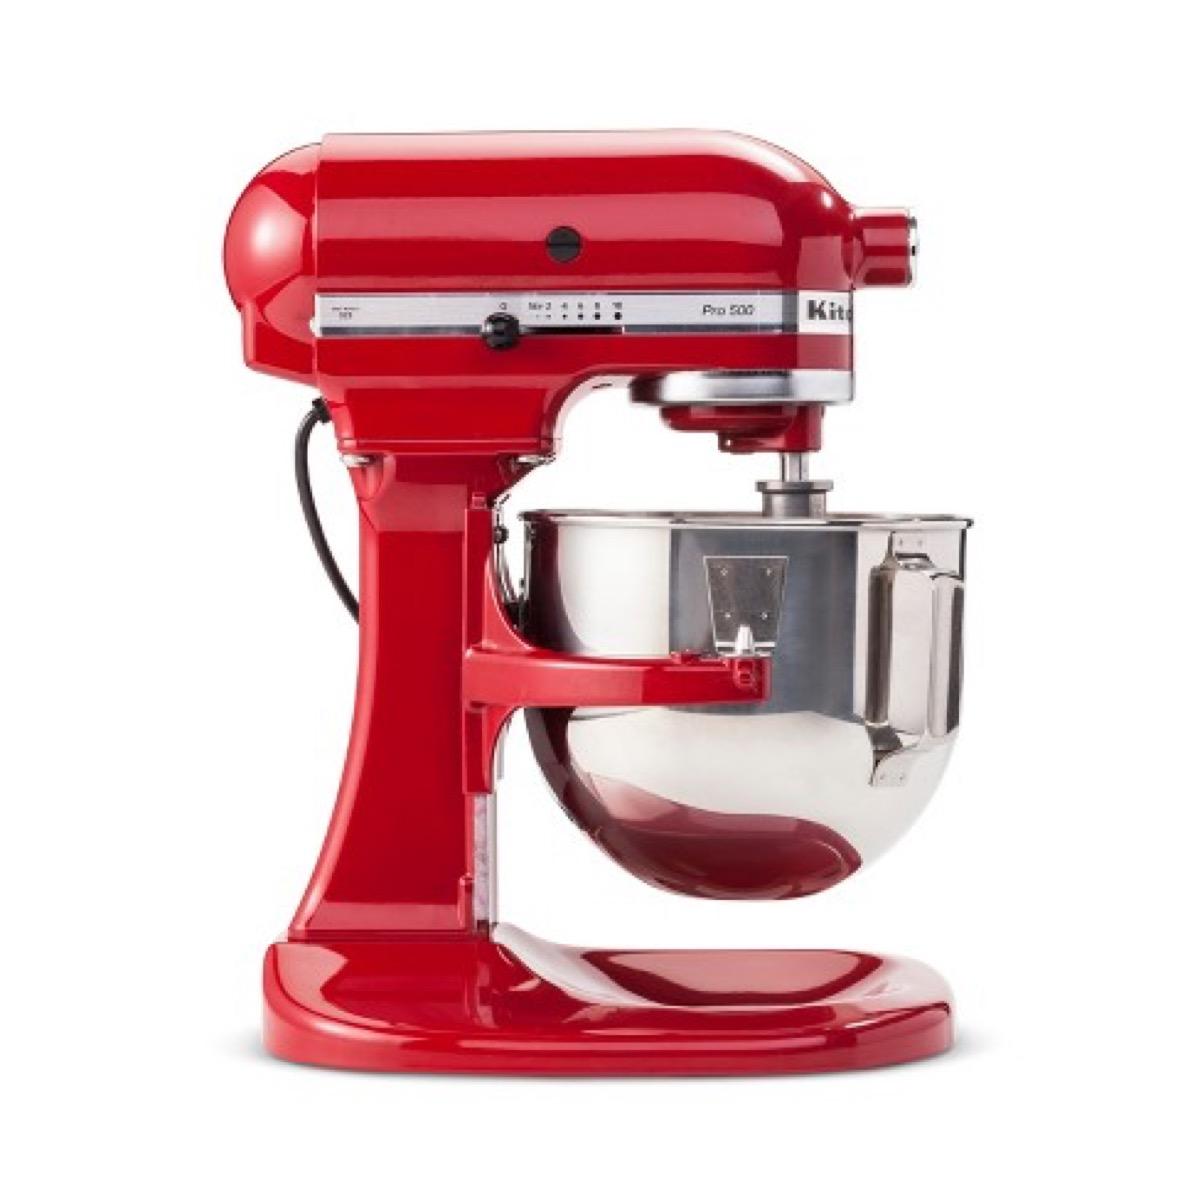 Red Kitchenaid mixer white background